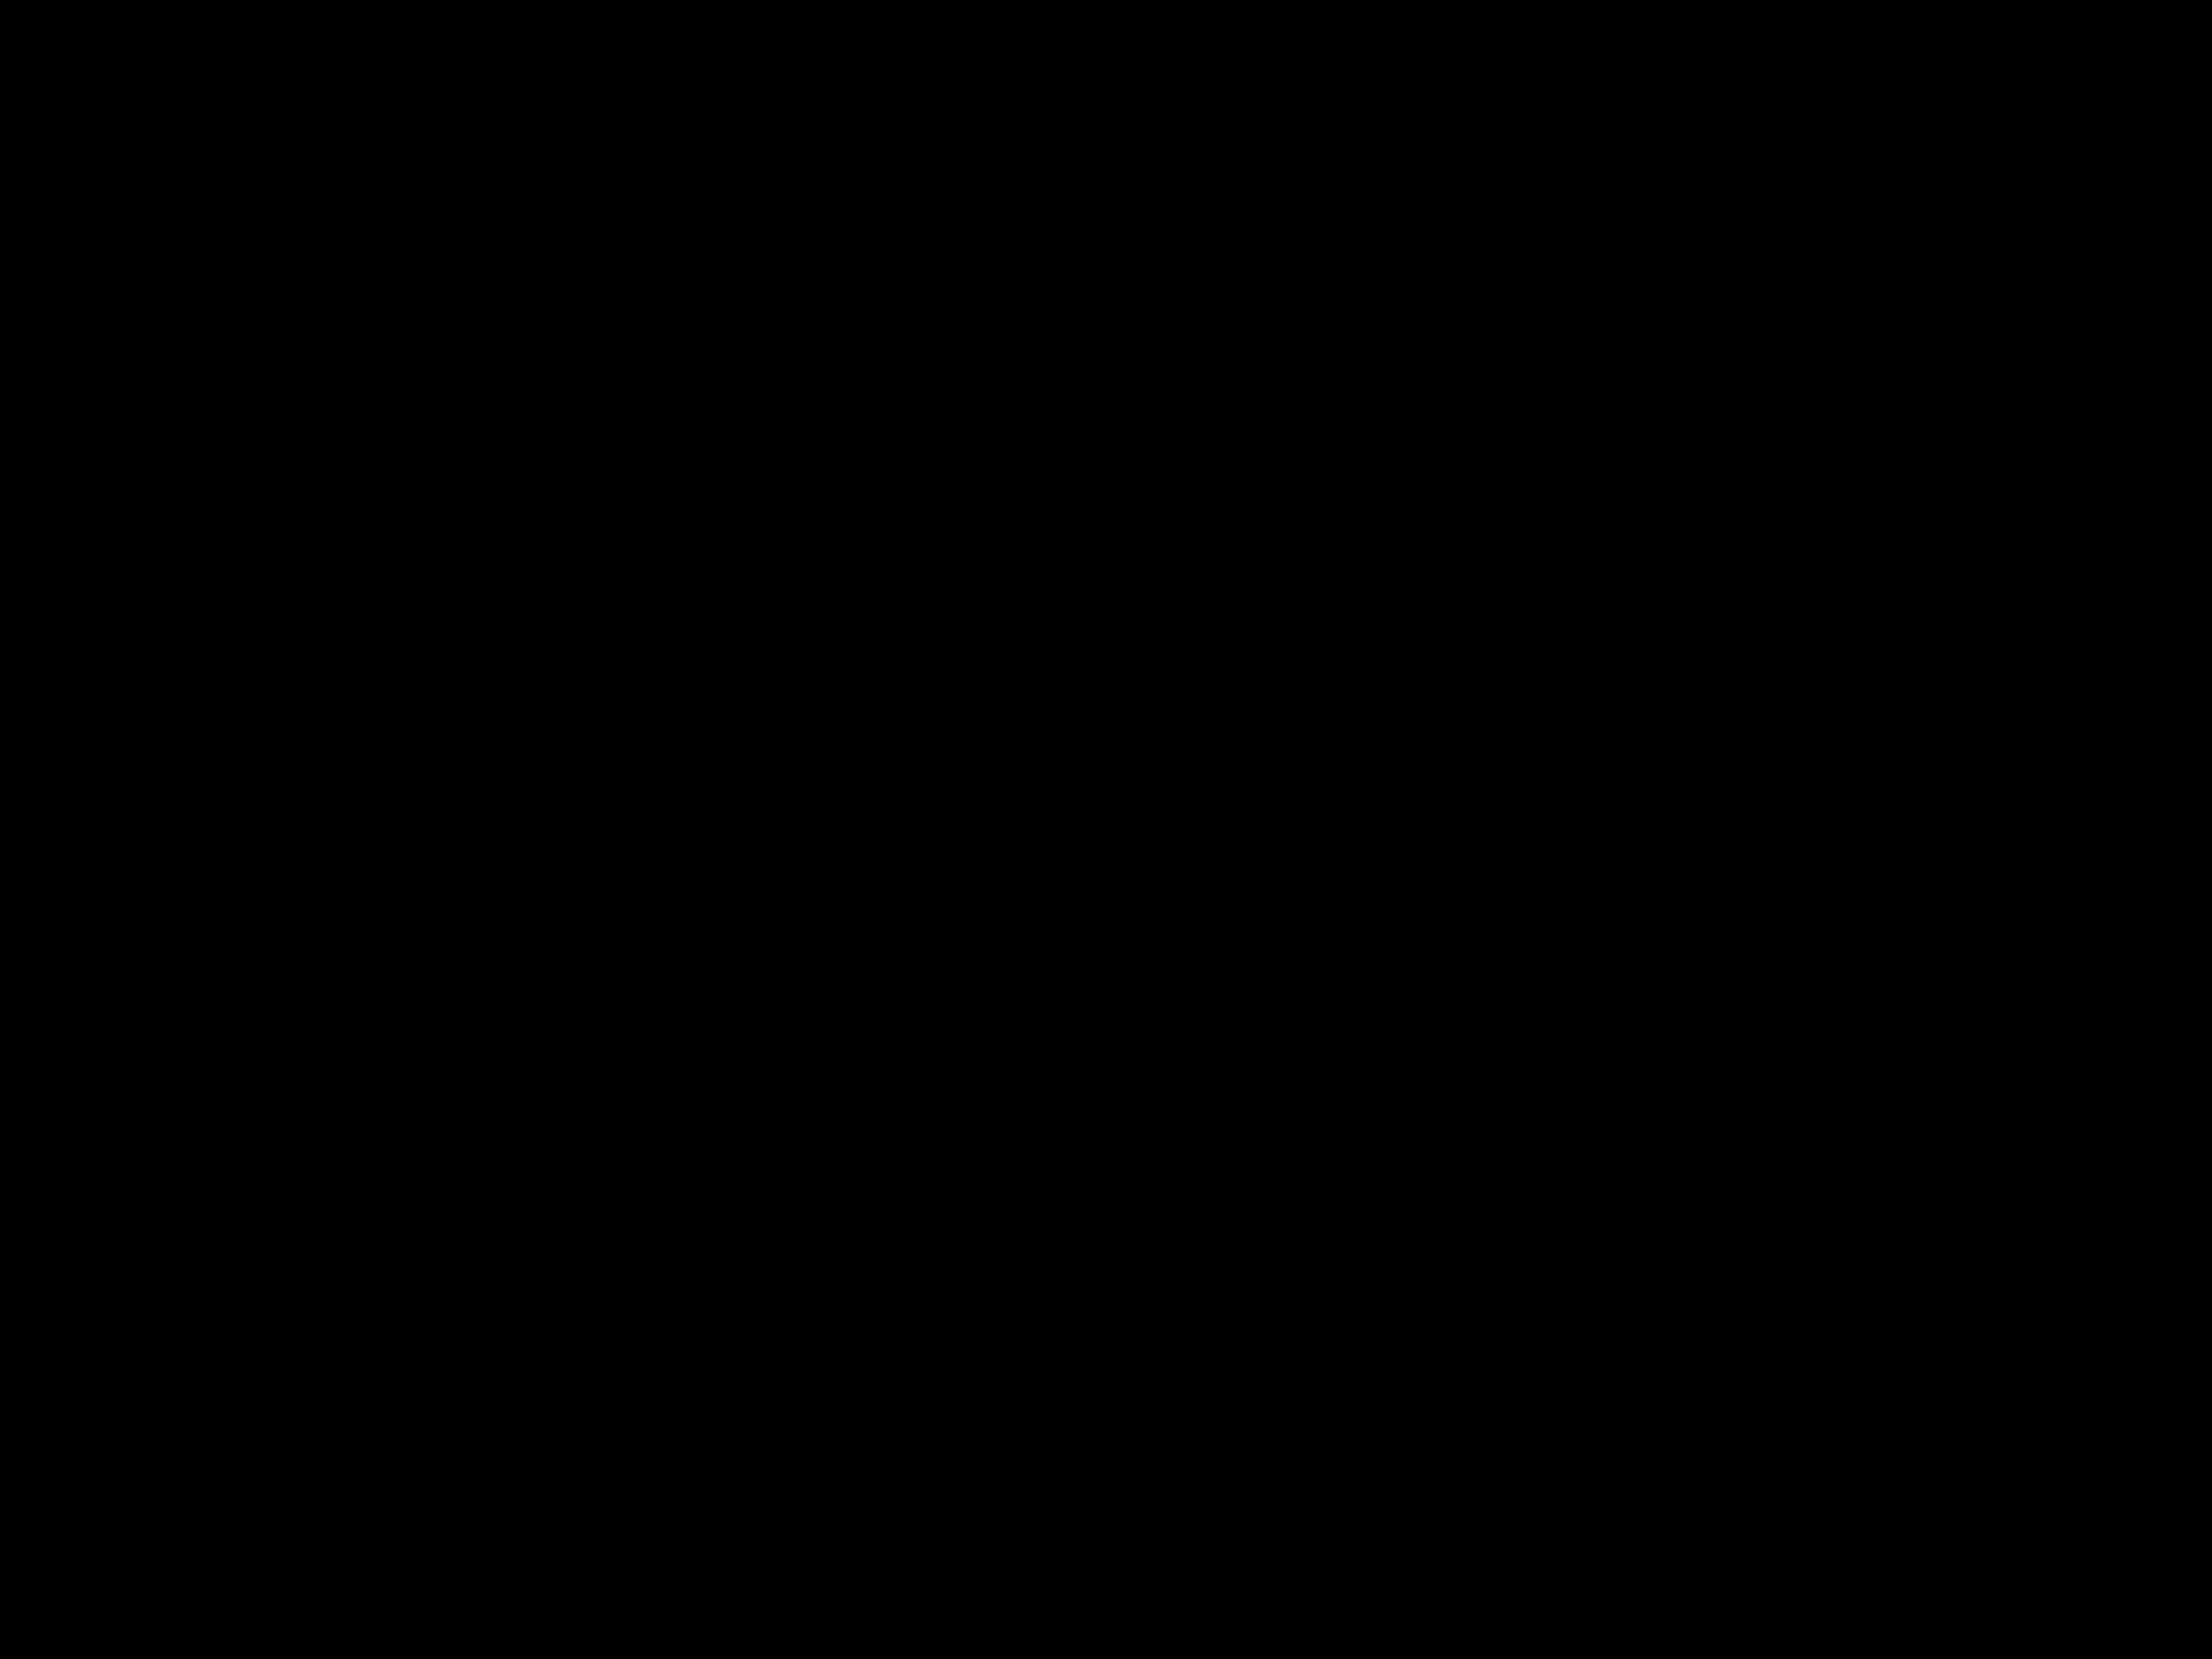 under-armour-logo-png-transparent.png